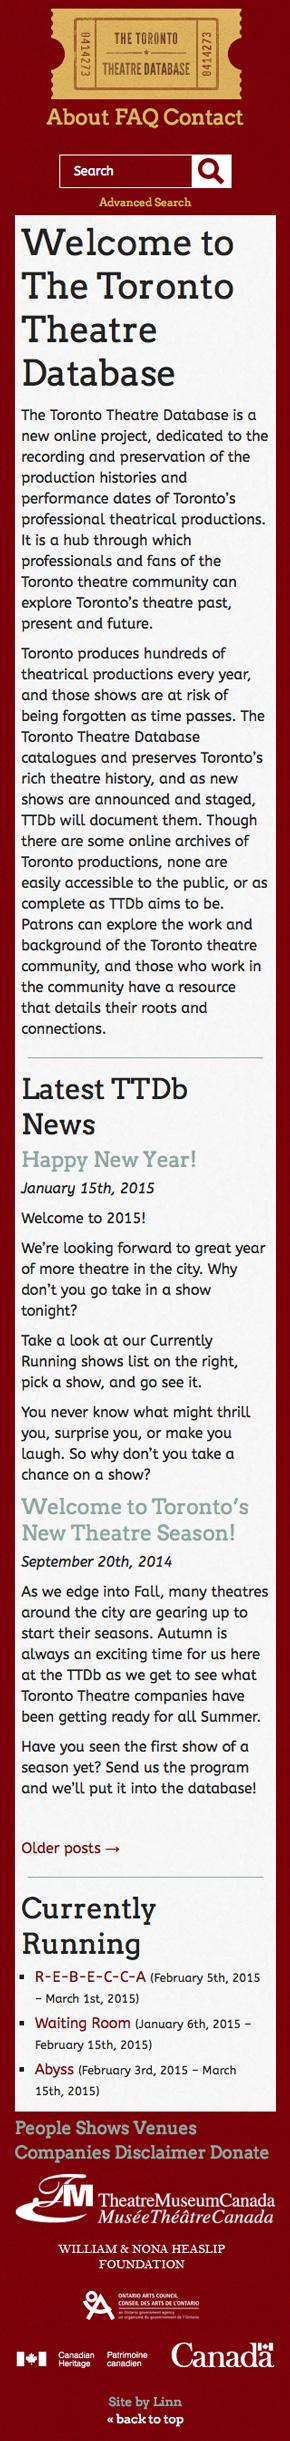 Toronto Theatre Database mobile